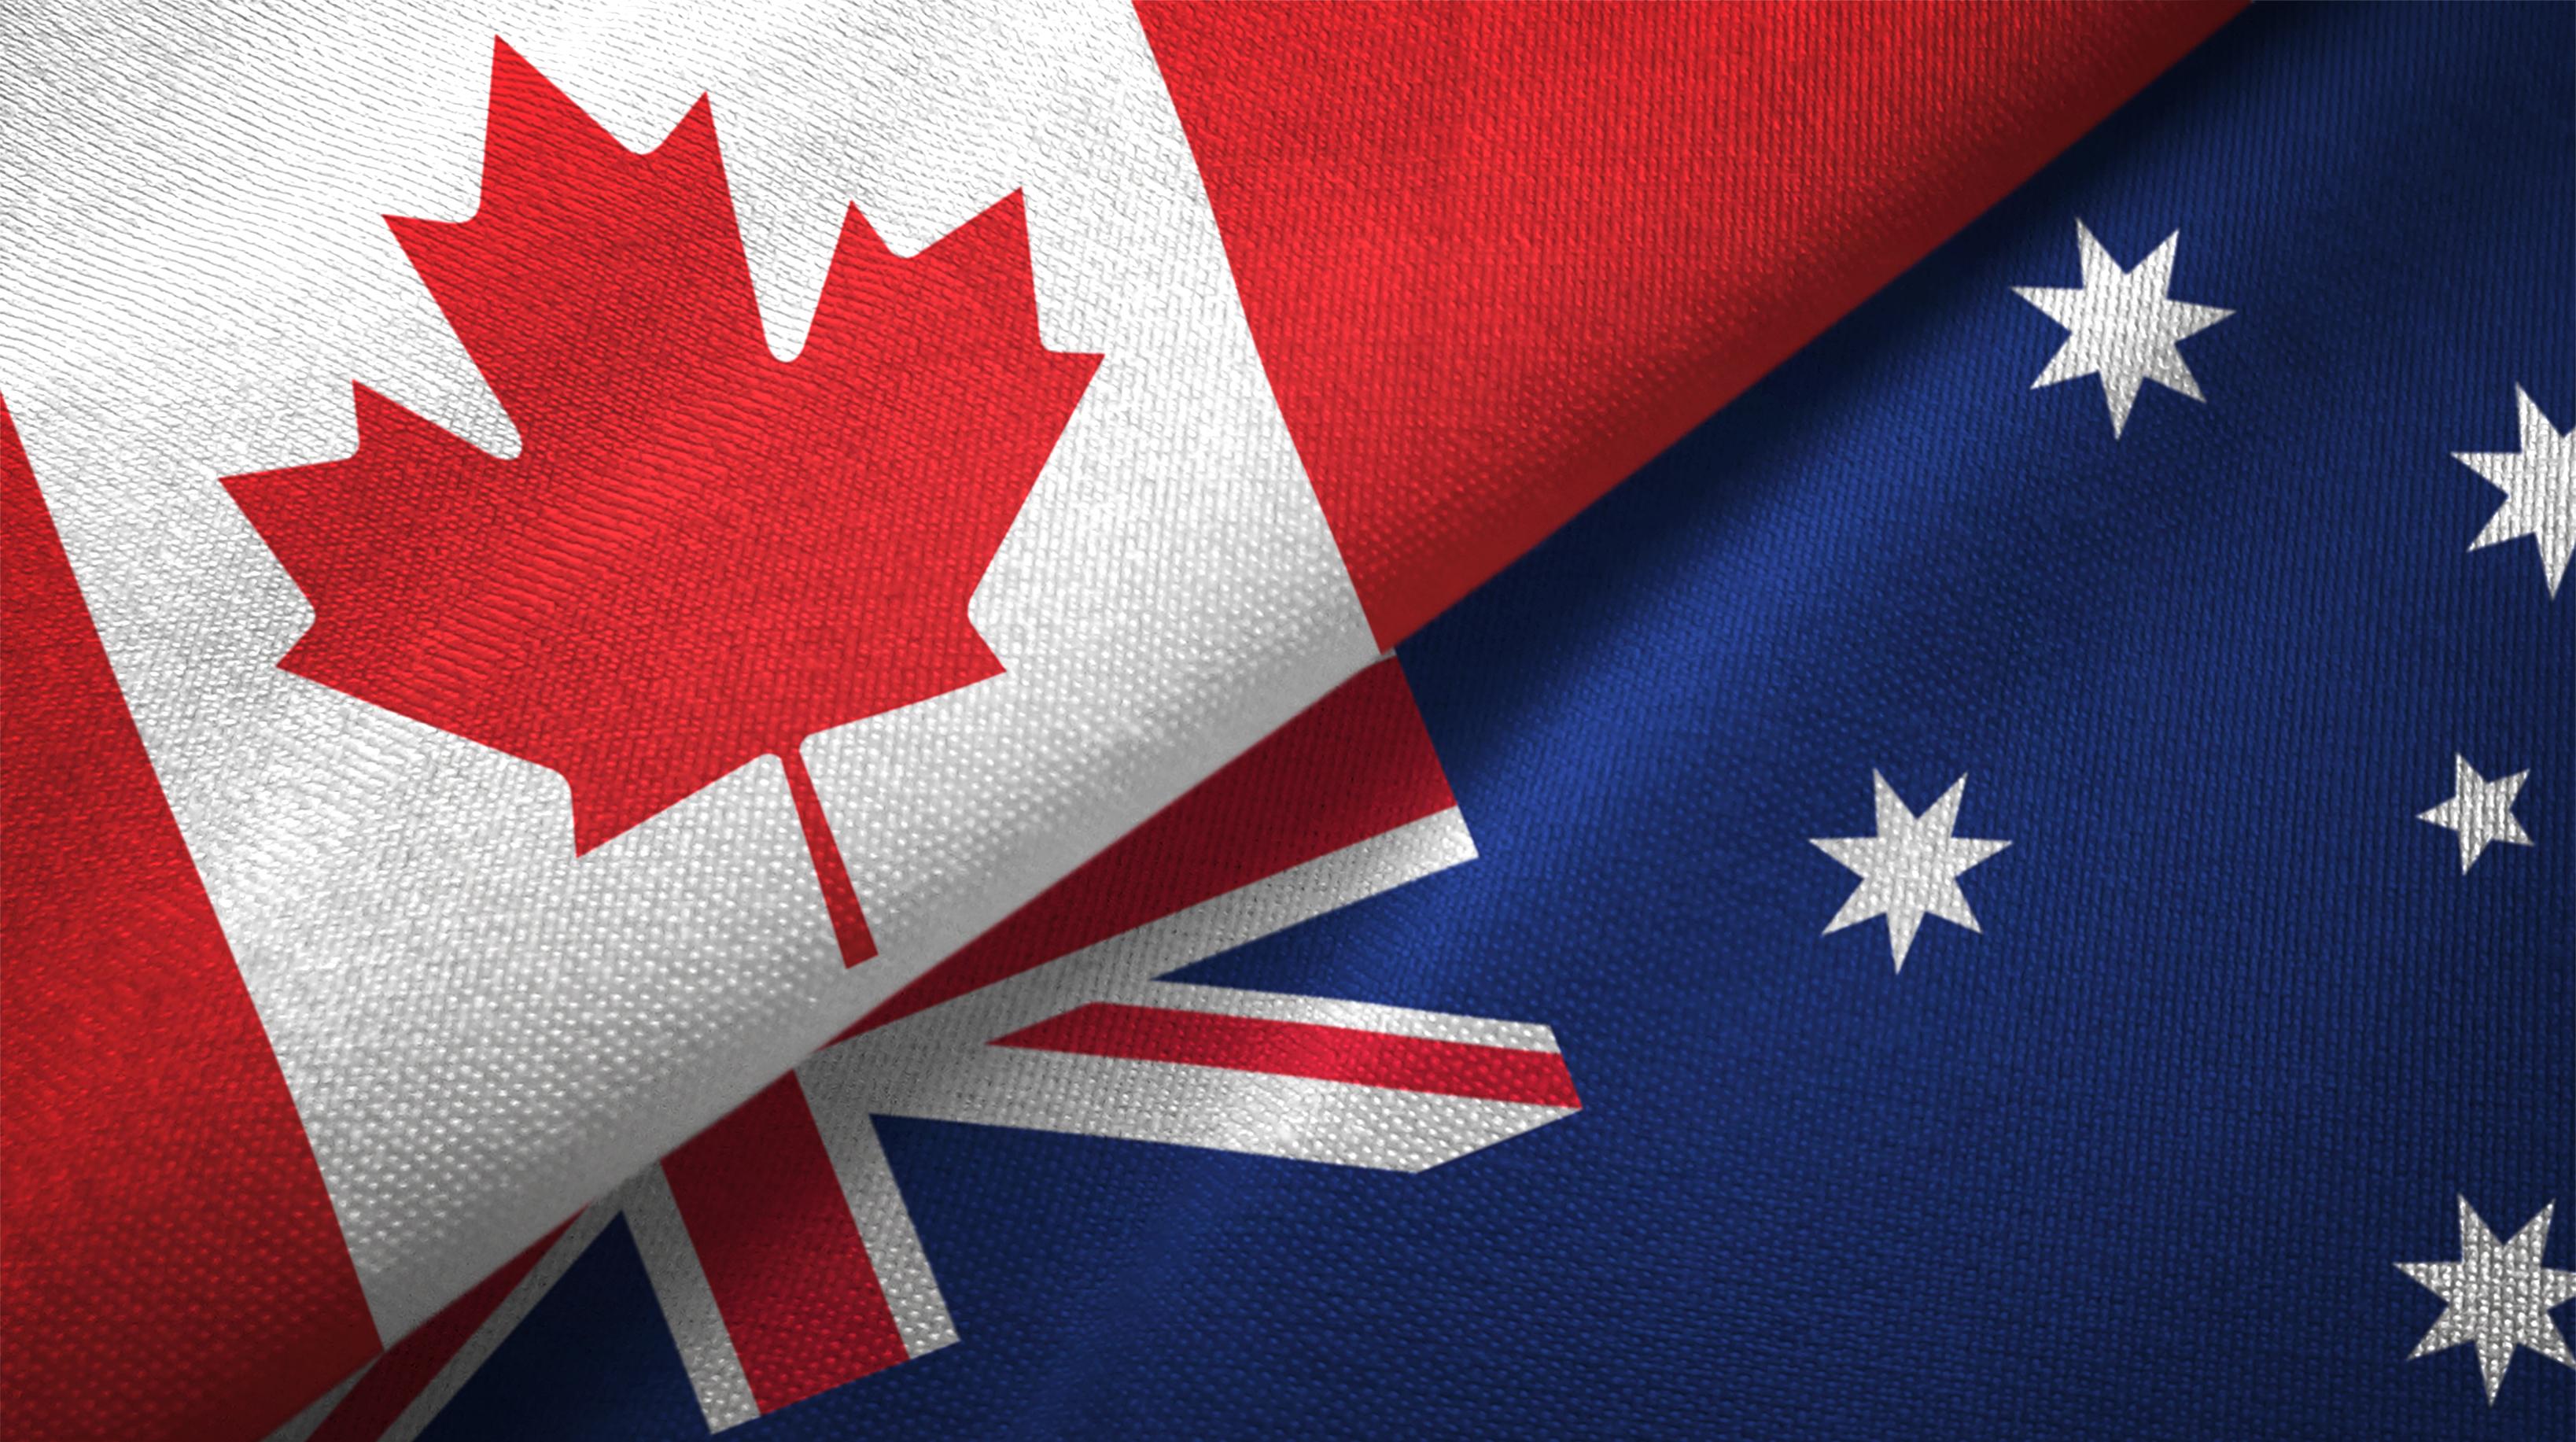 Etichettatura Australia e Canada (online)